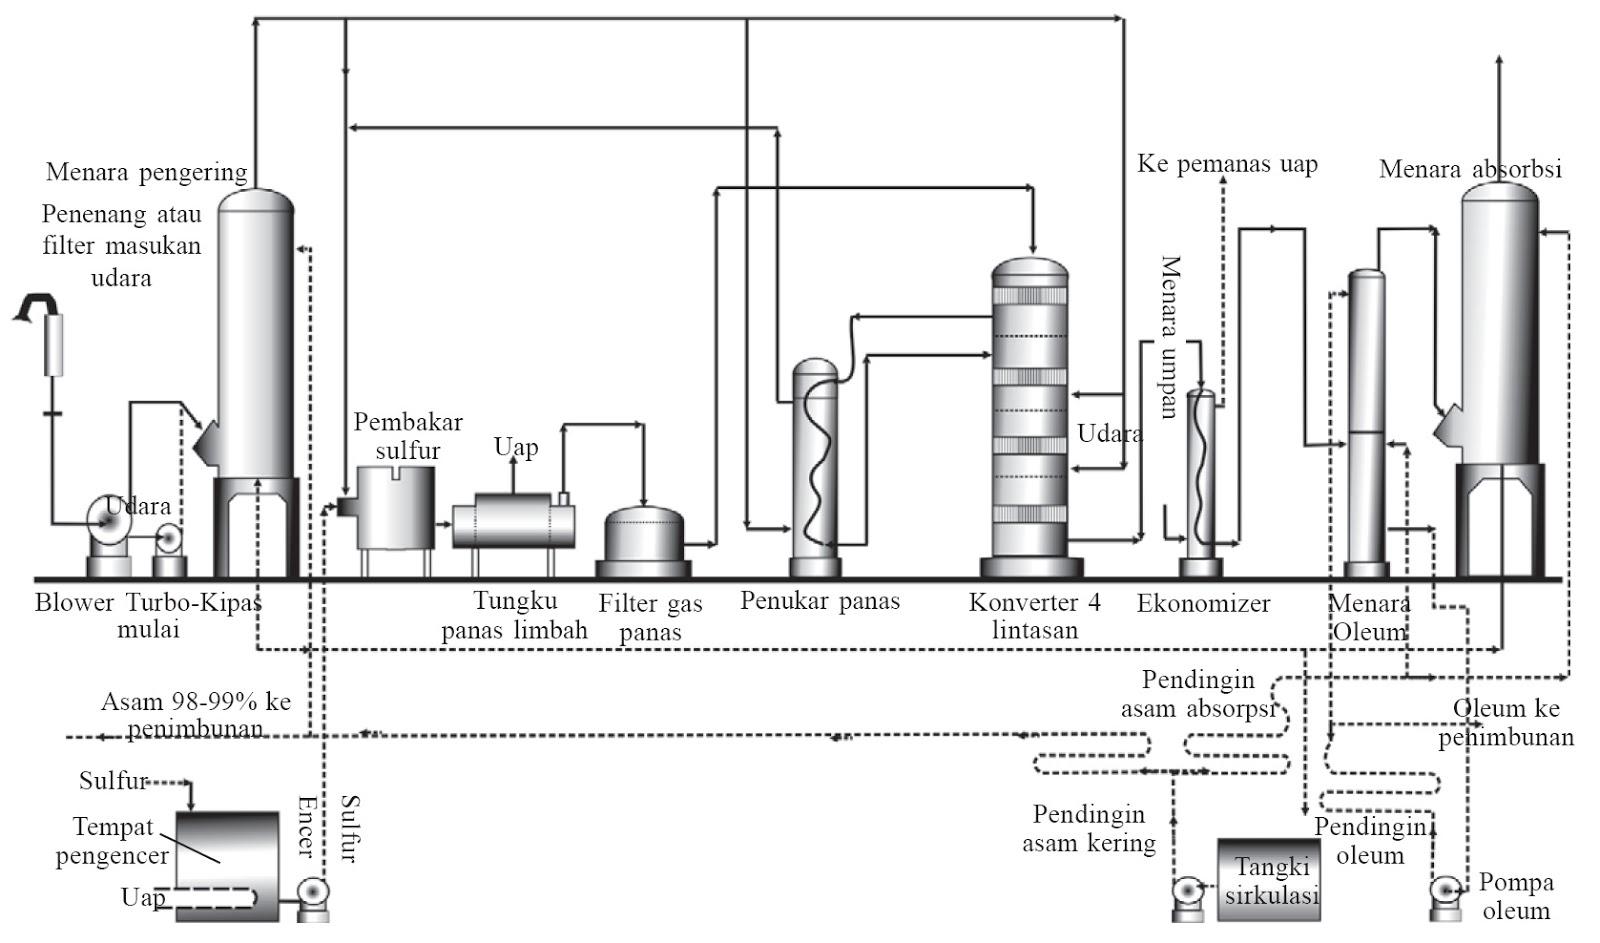 Contoh Penerapan Kesetimbangan Kimia Di Dalam Industri